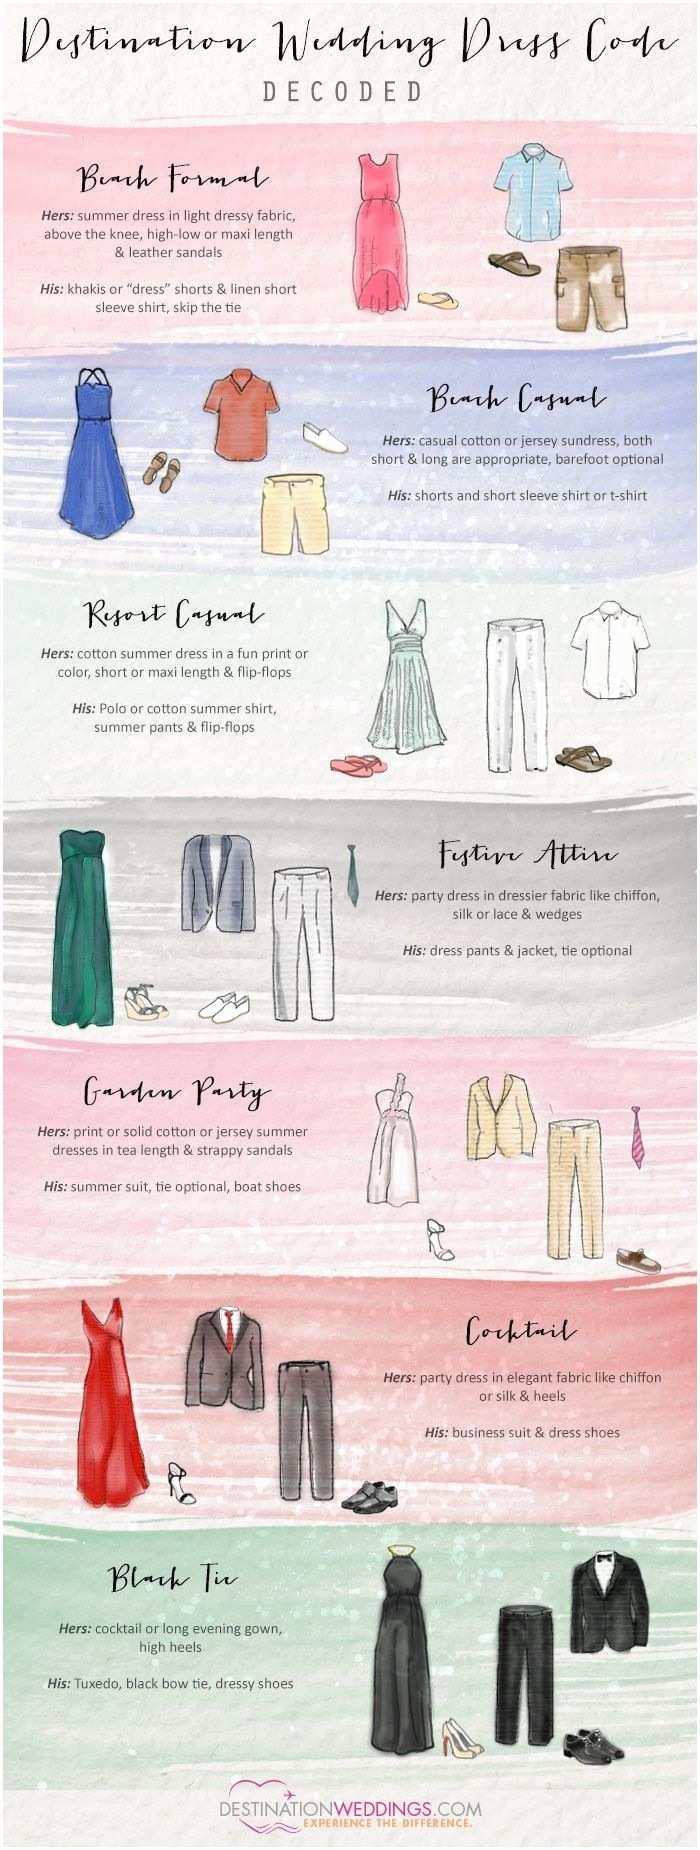 Wedding Invitation Dress Code Best 25 Beach Formal Attire Ideas On